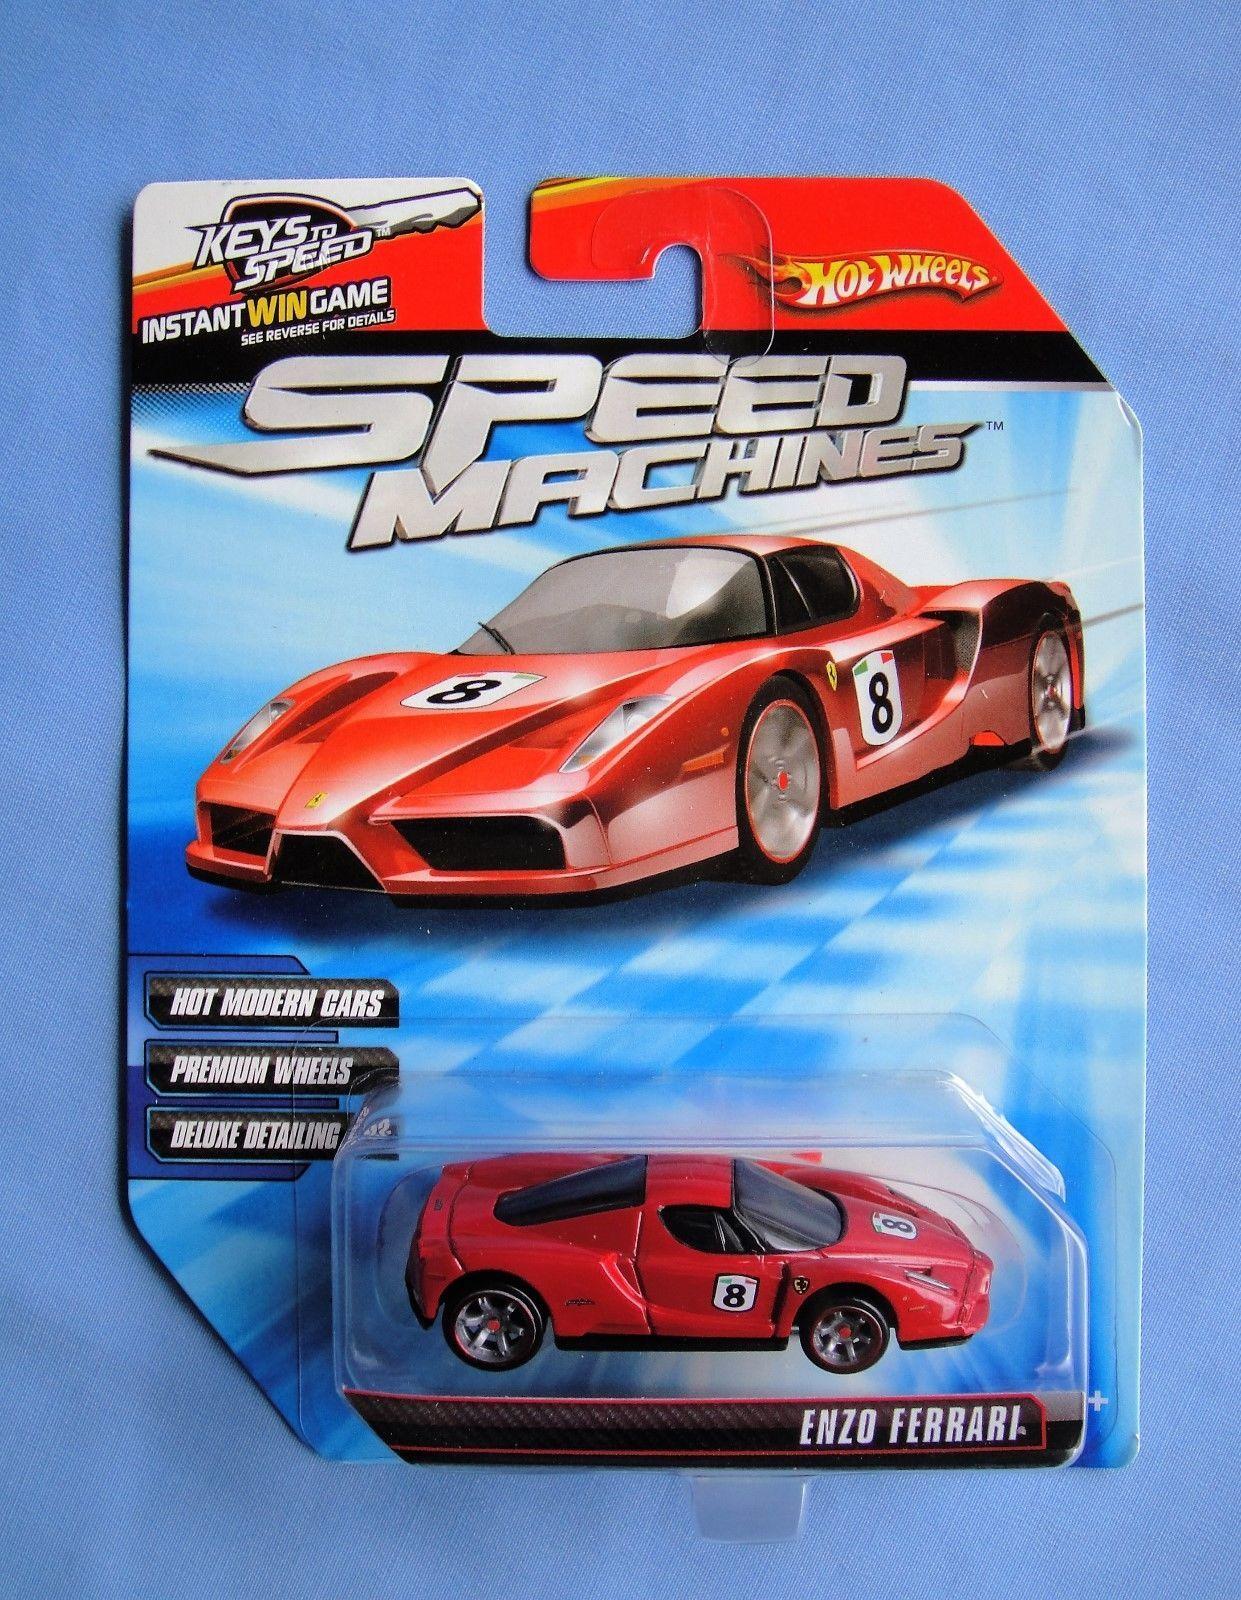 2009 Hot Wheels Speed Machines Enzo Ferrari Red Ebay With